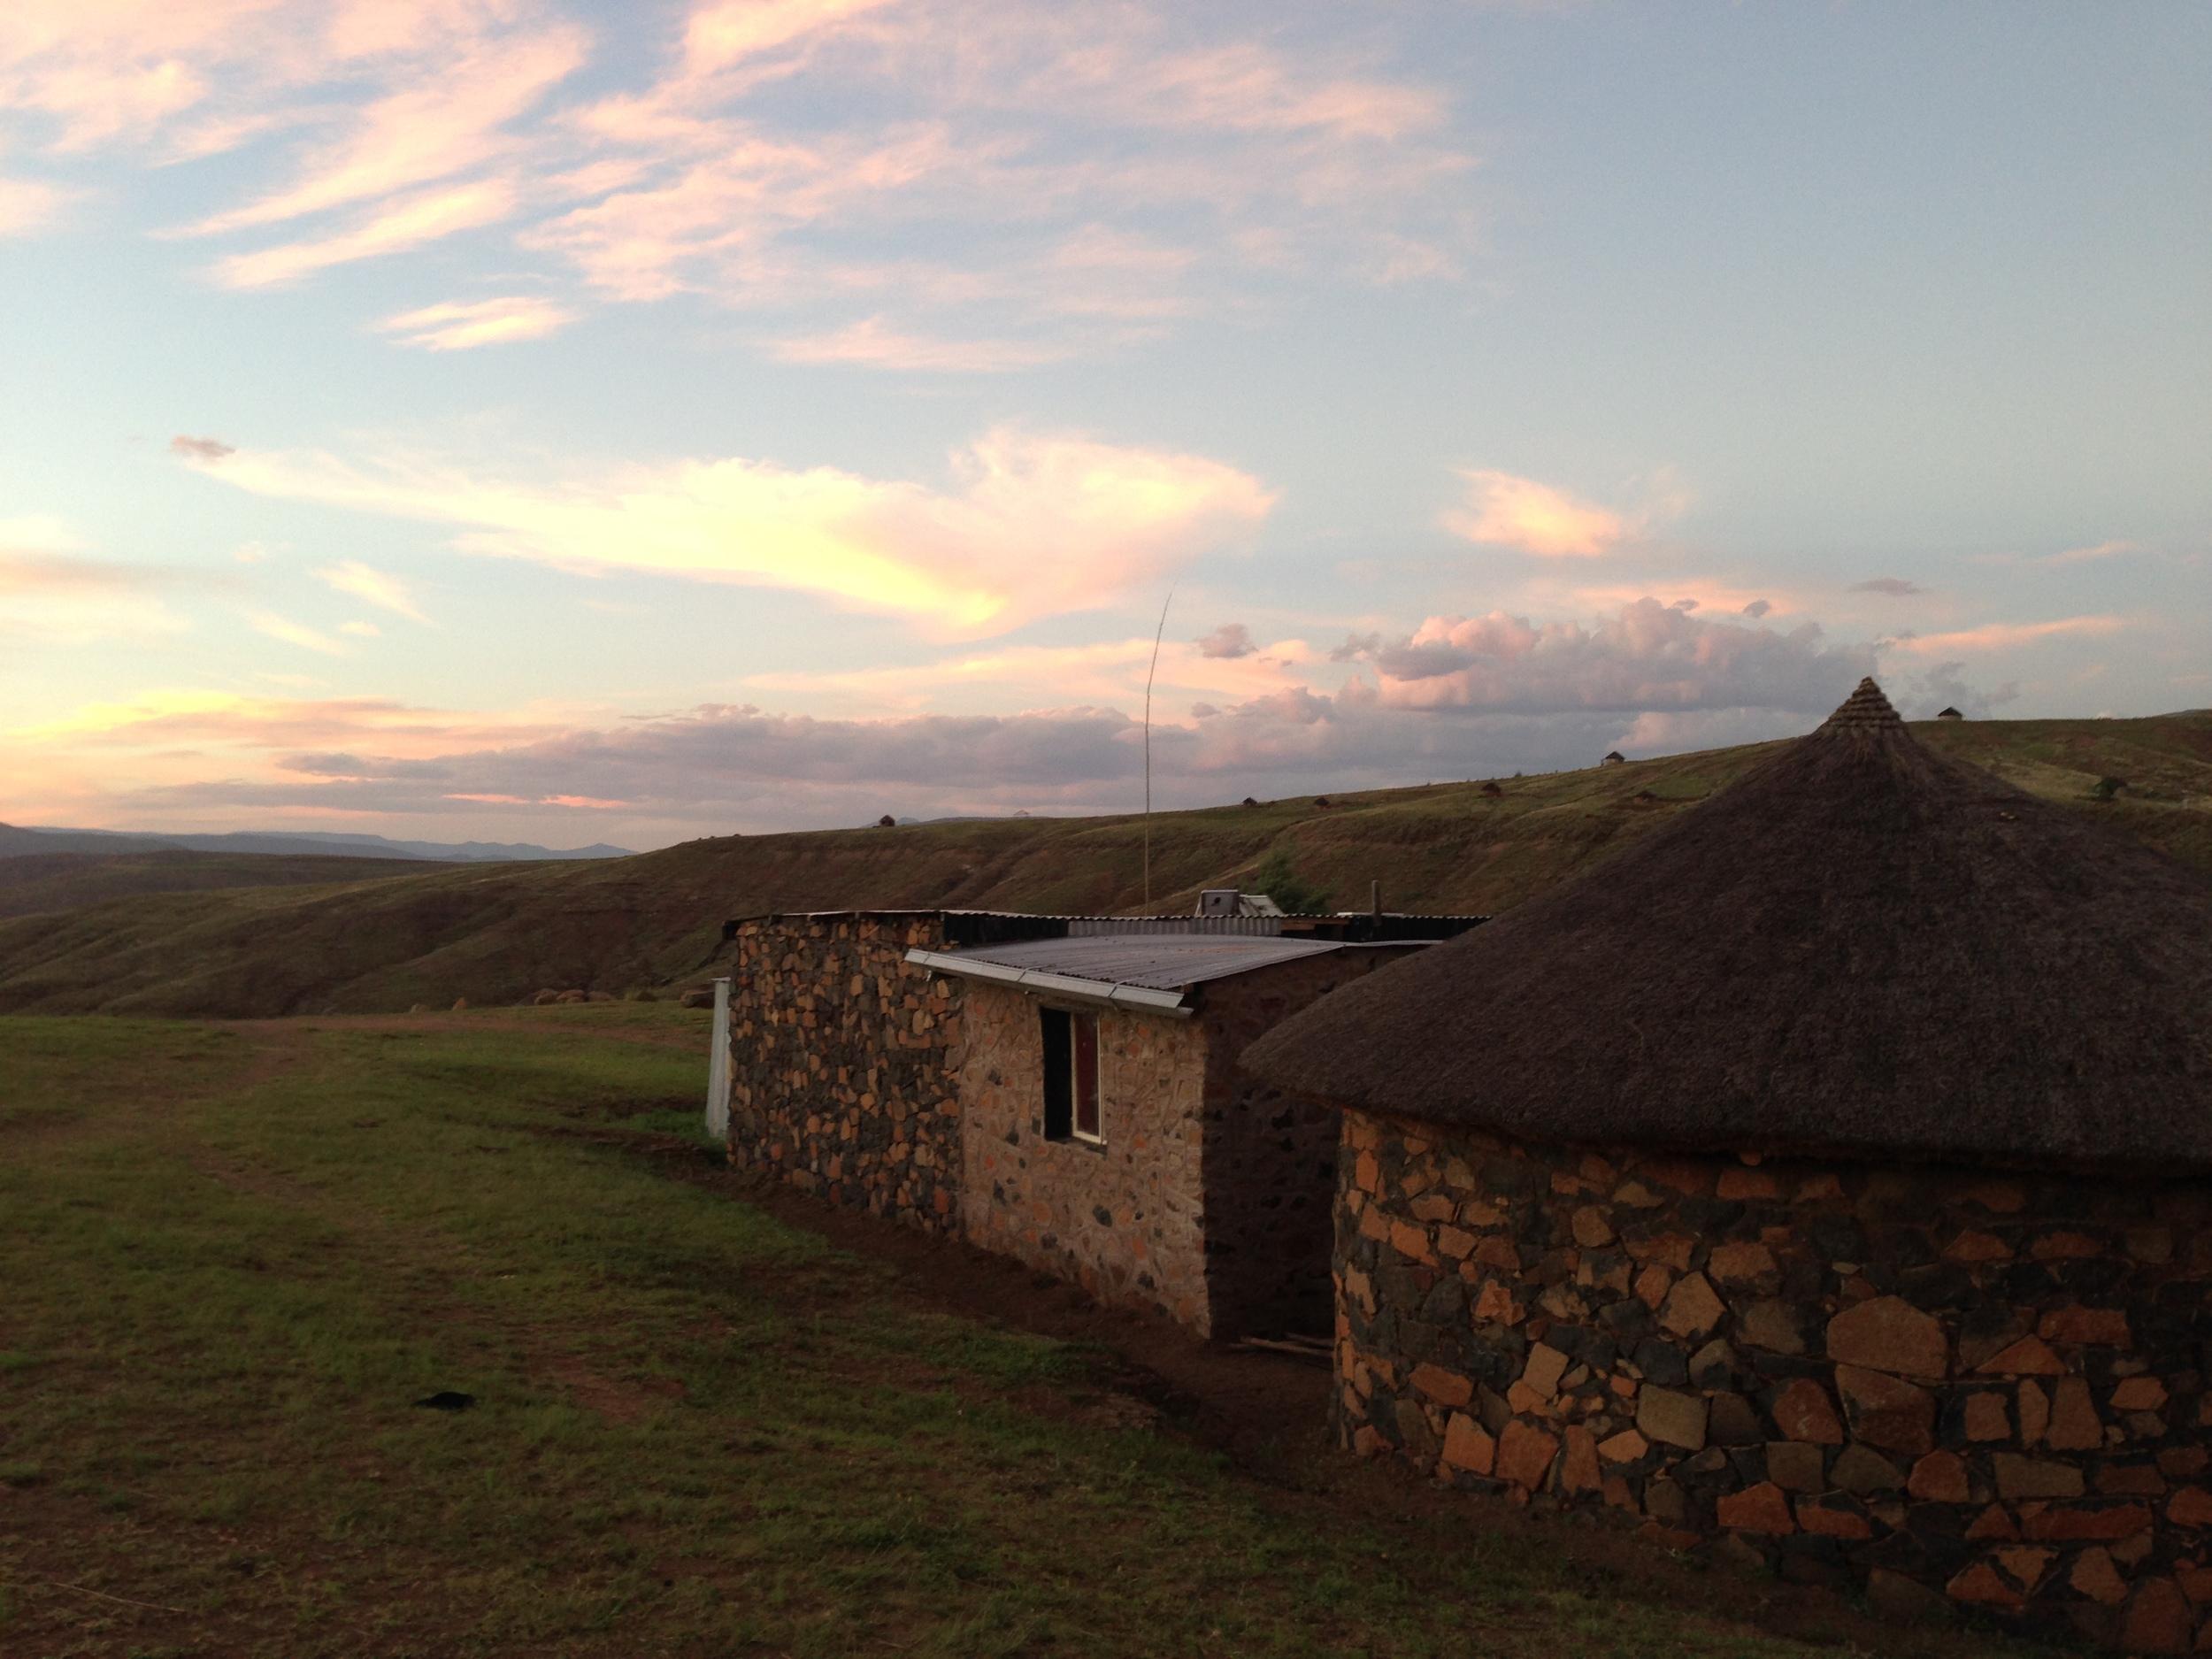 Sunset in Makhotso.